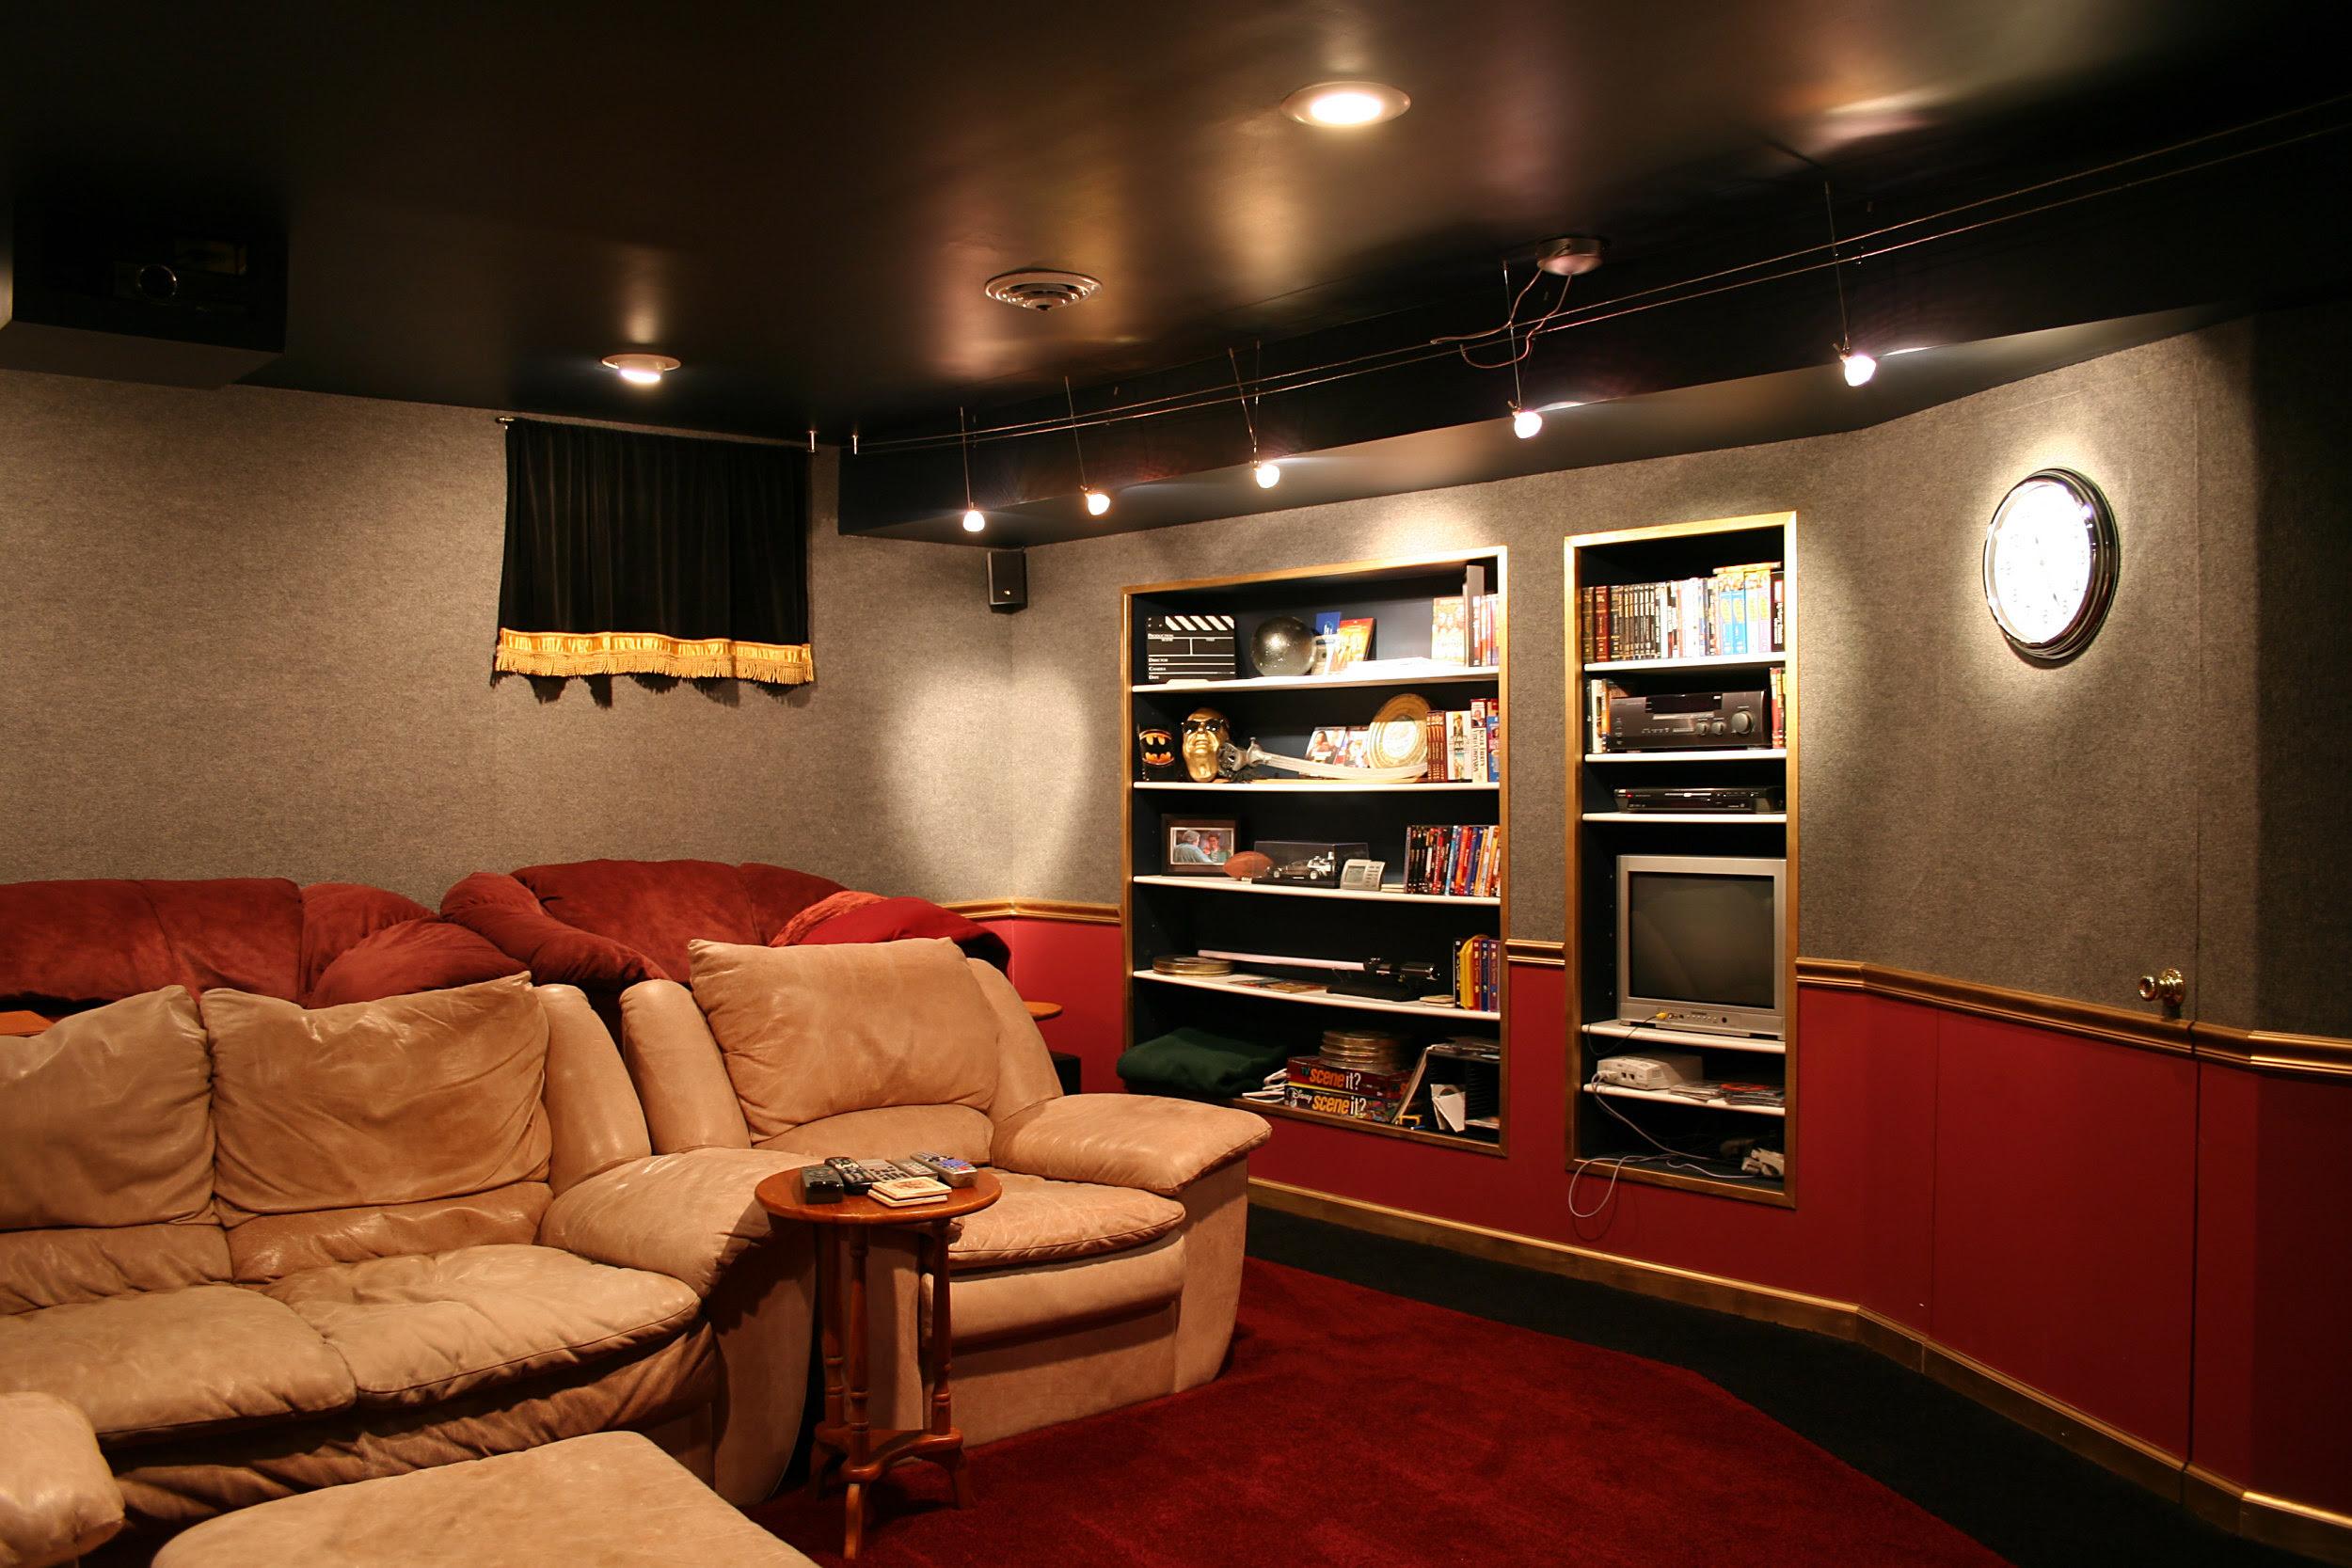 Home cinema - Wikipedia, the free encyclopedia